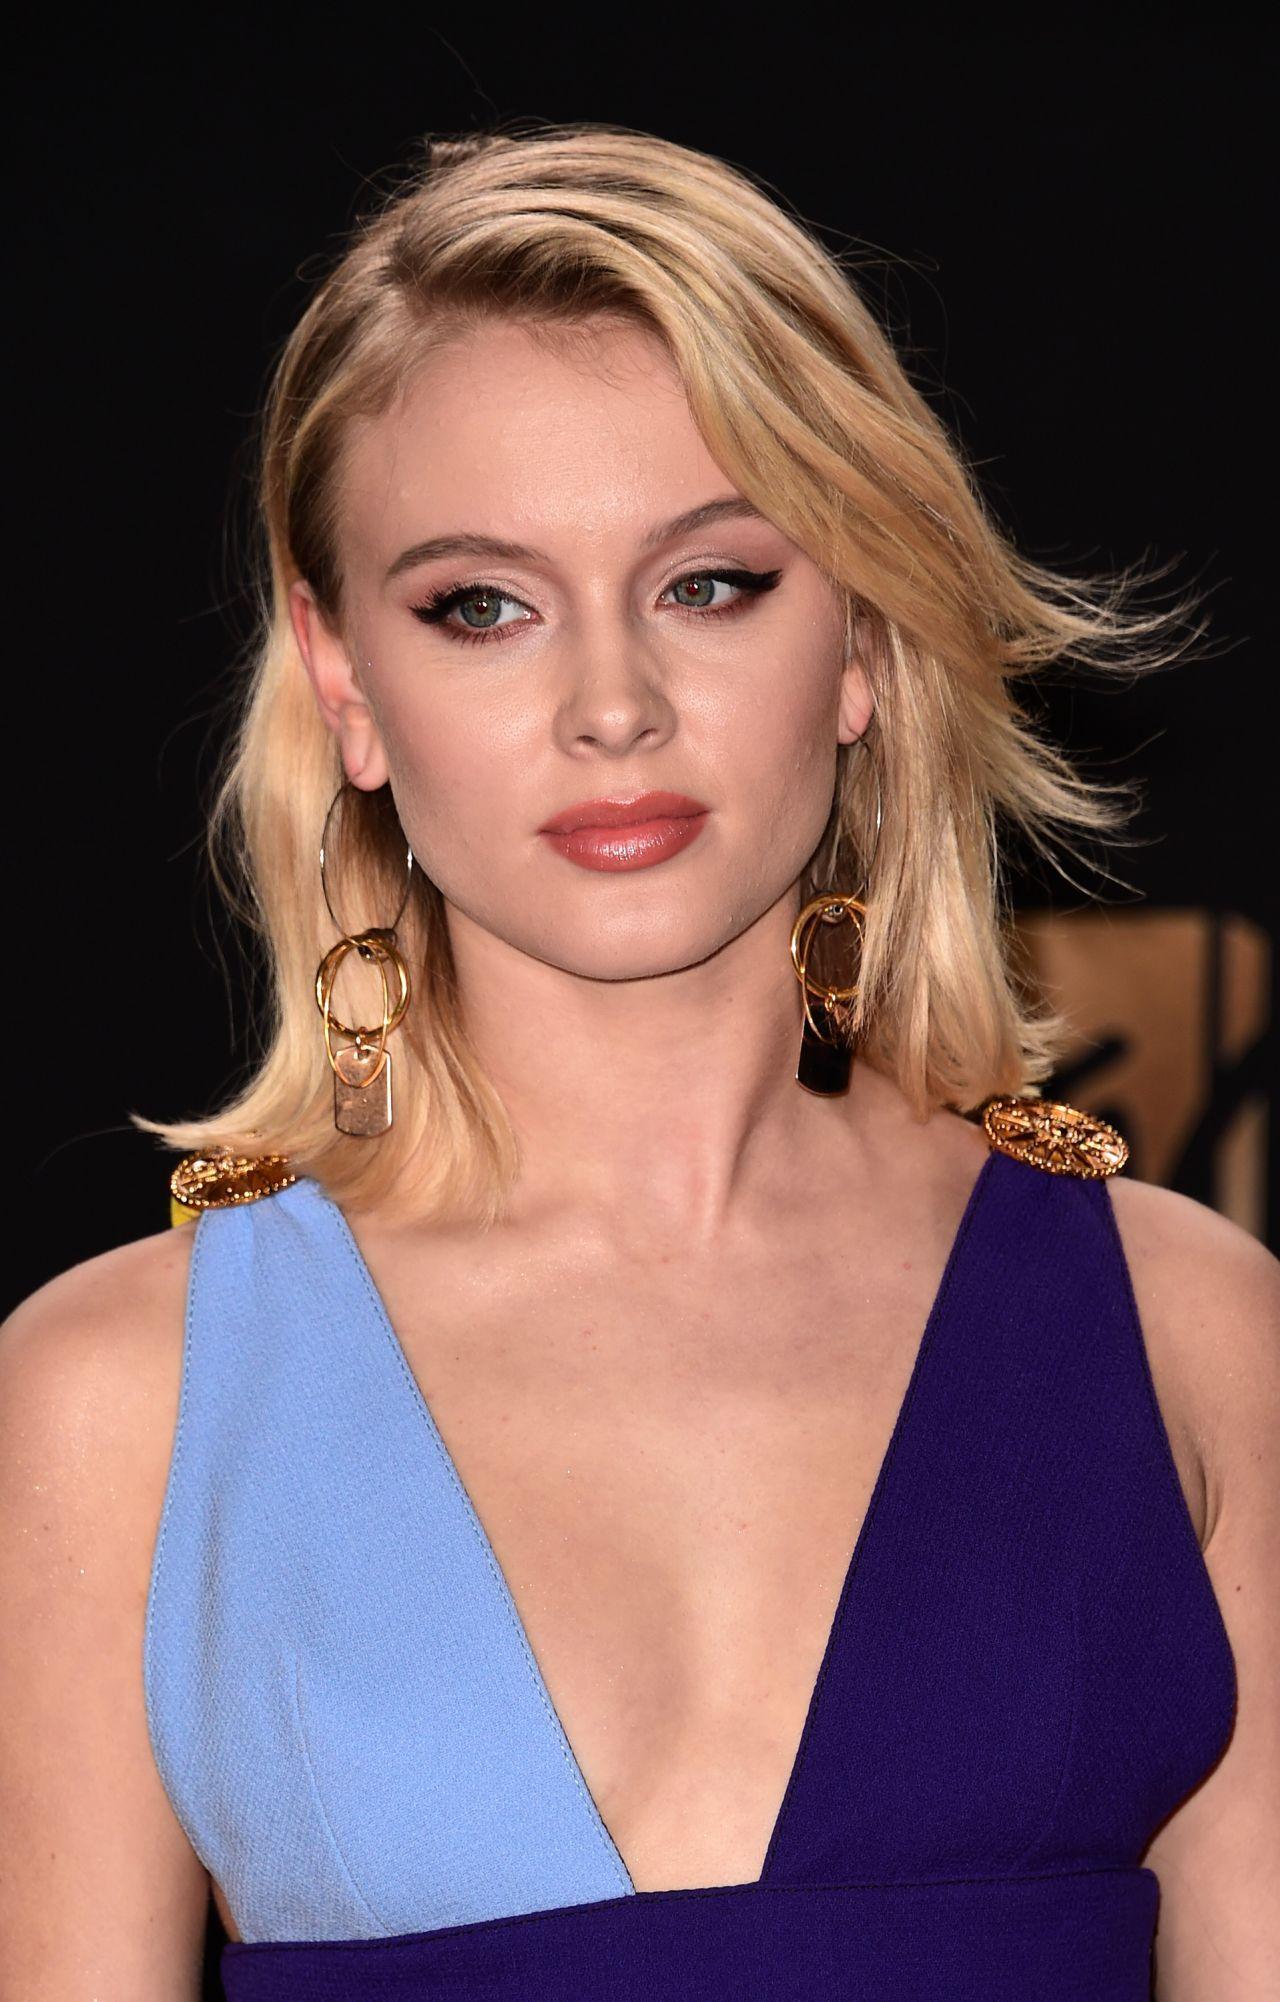 Zara Larsson #ZaraLarsson MTV Movie and TV Awards in Los Angeles 07/05/2017 http://ift.tt/2uUPSx7